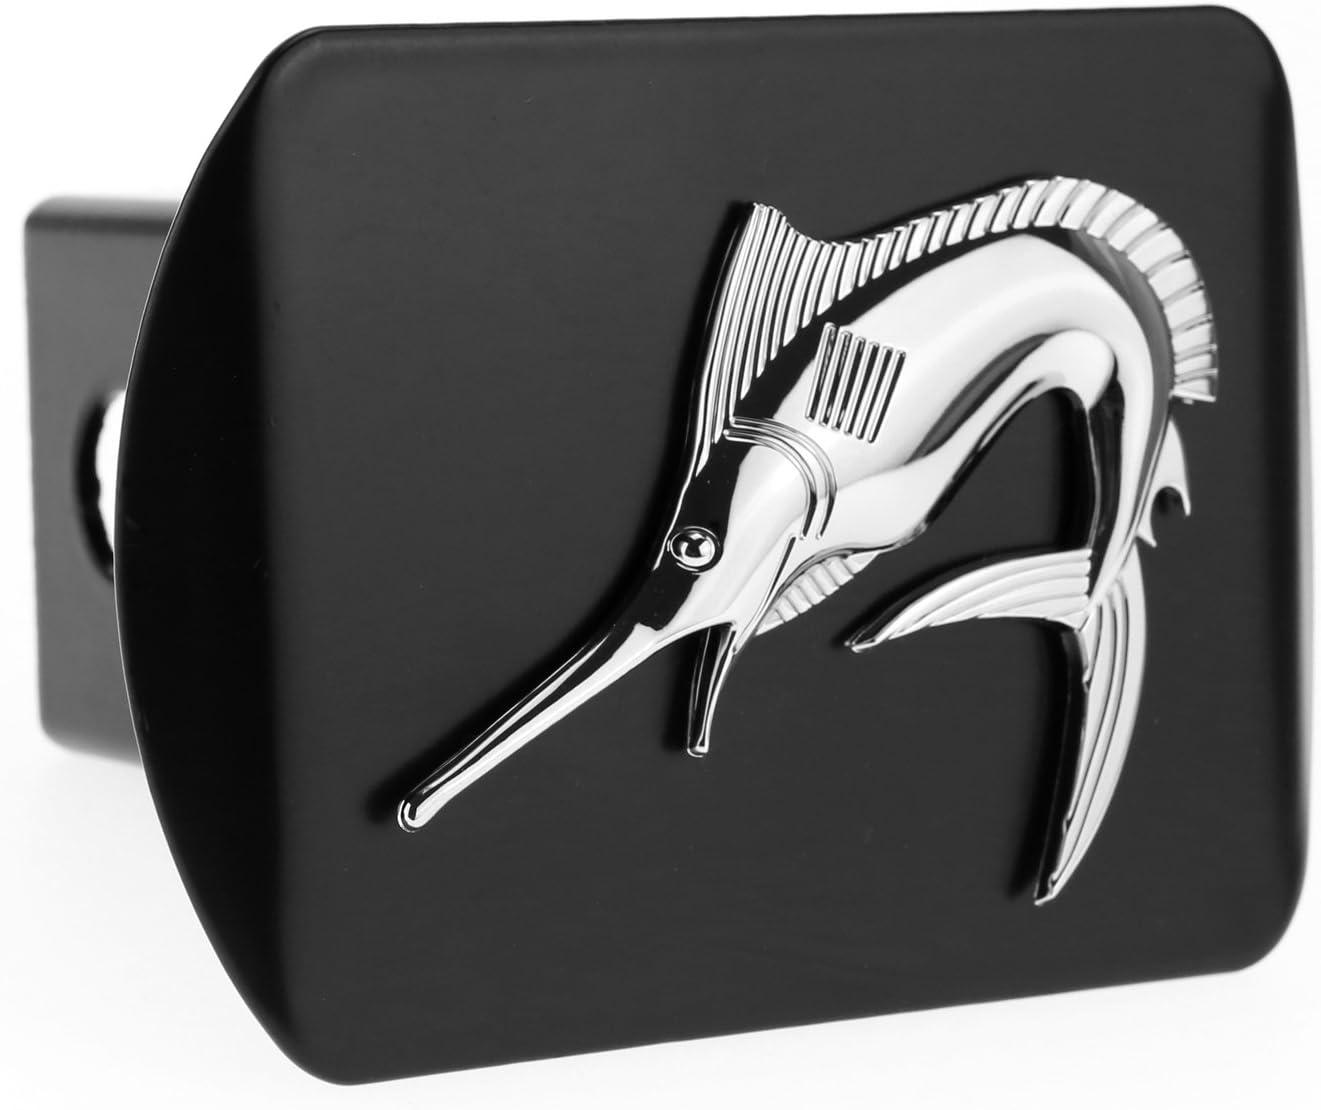 LFPartS Marlin Swordfish Fishing Fish 3D Chrome Emblem on Black Trailer Metal Hitch Cover Fits 2 Receivers